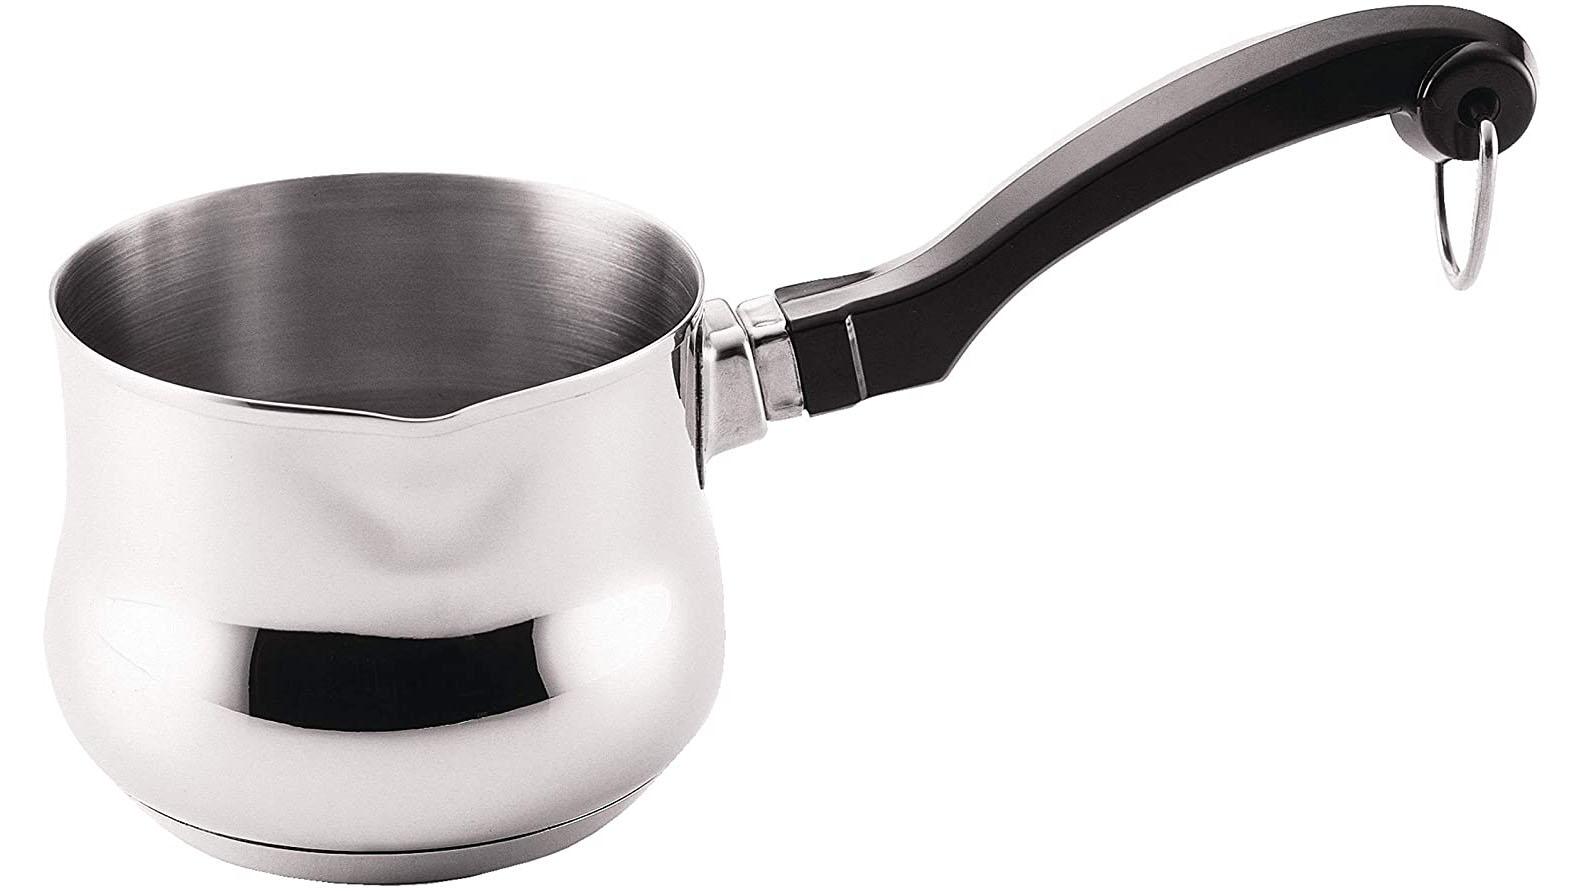 Farberware butter warmer